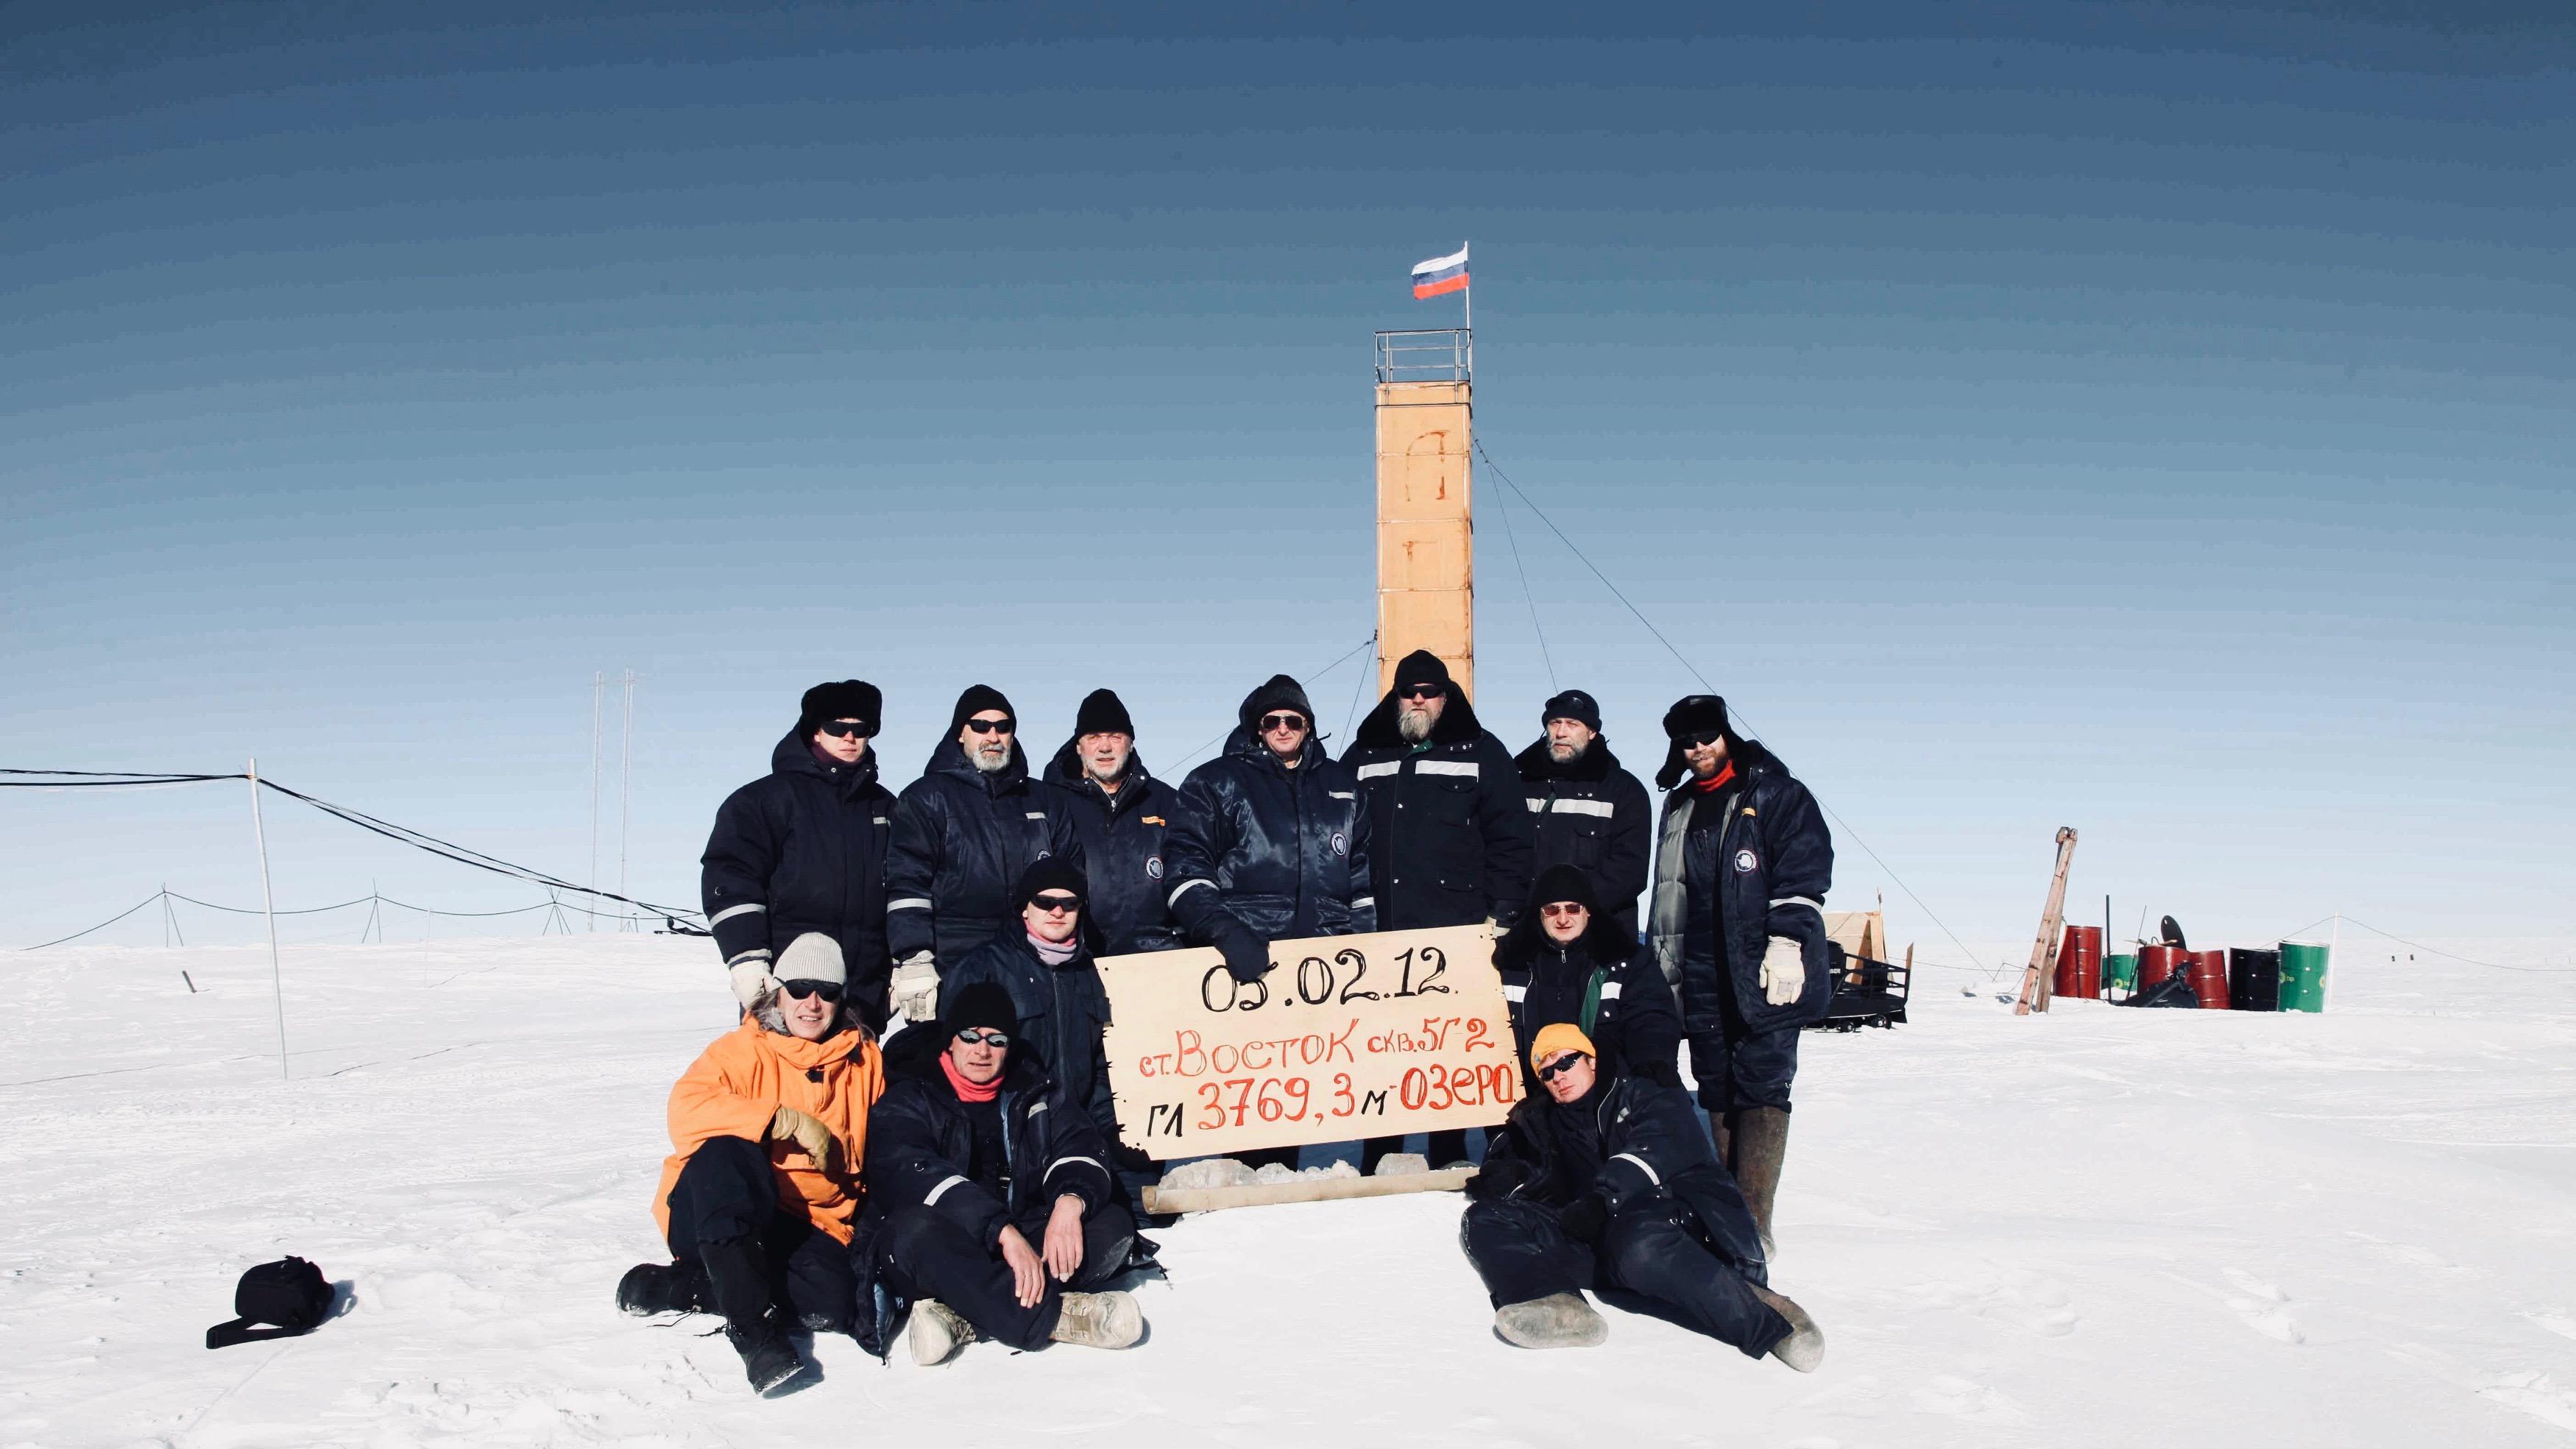 Russian researchers in Antarctica.